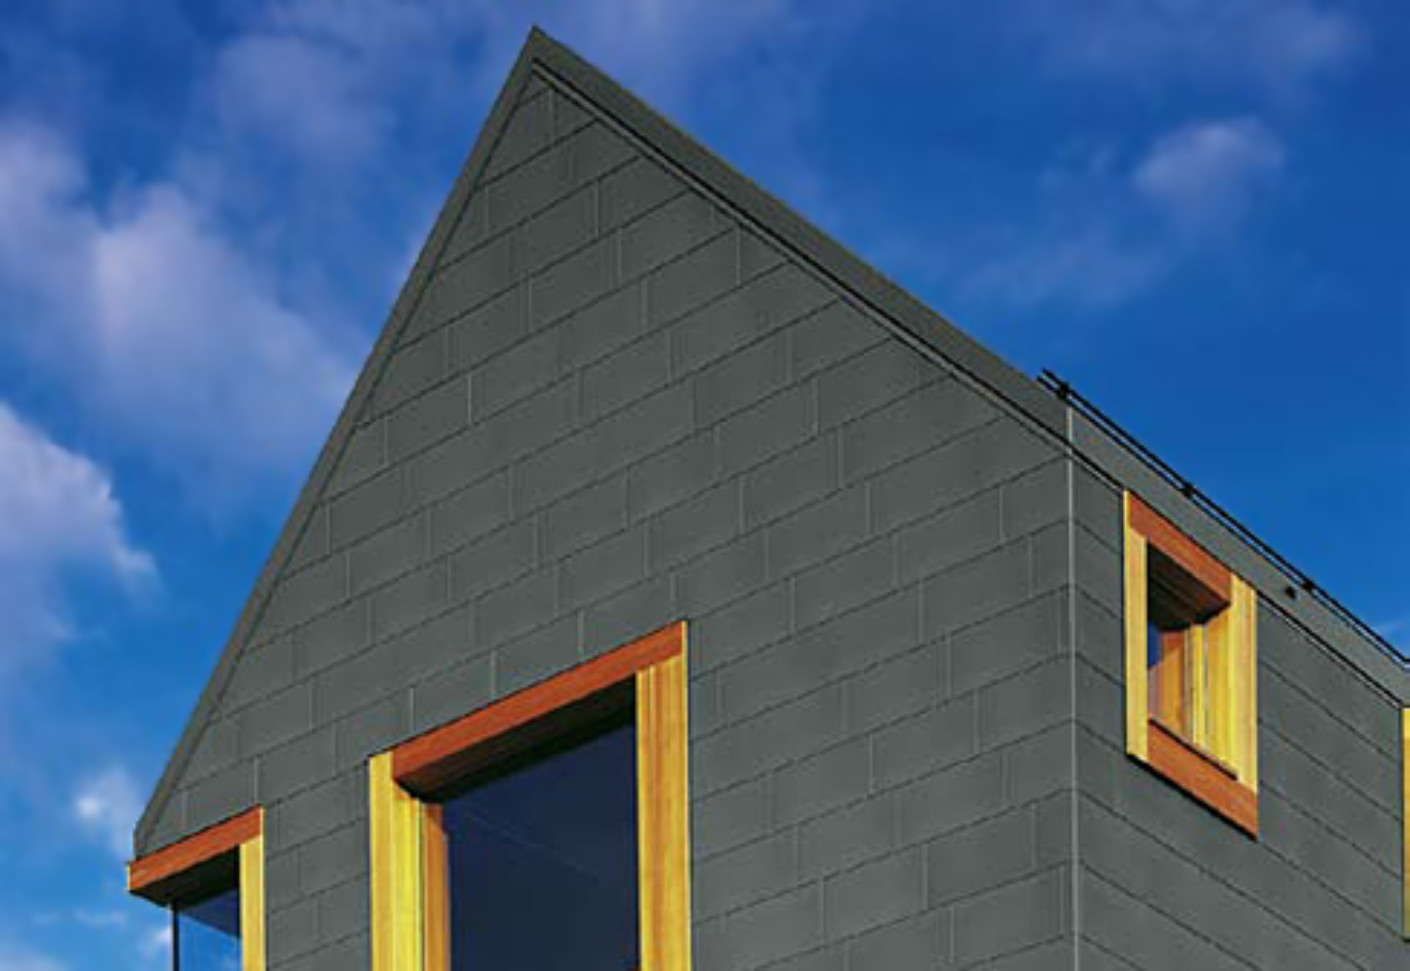 Tile Systems preweatheredpro graphitegrey by Rheinzink